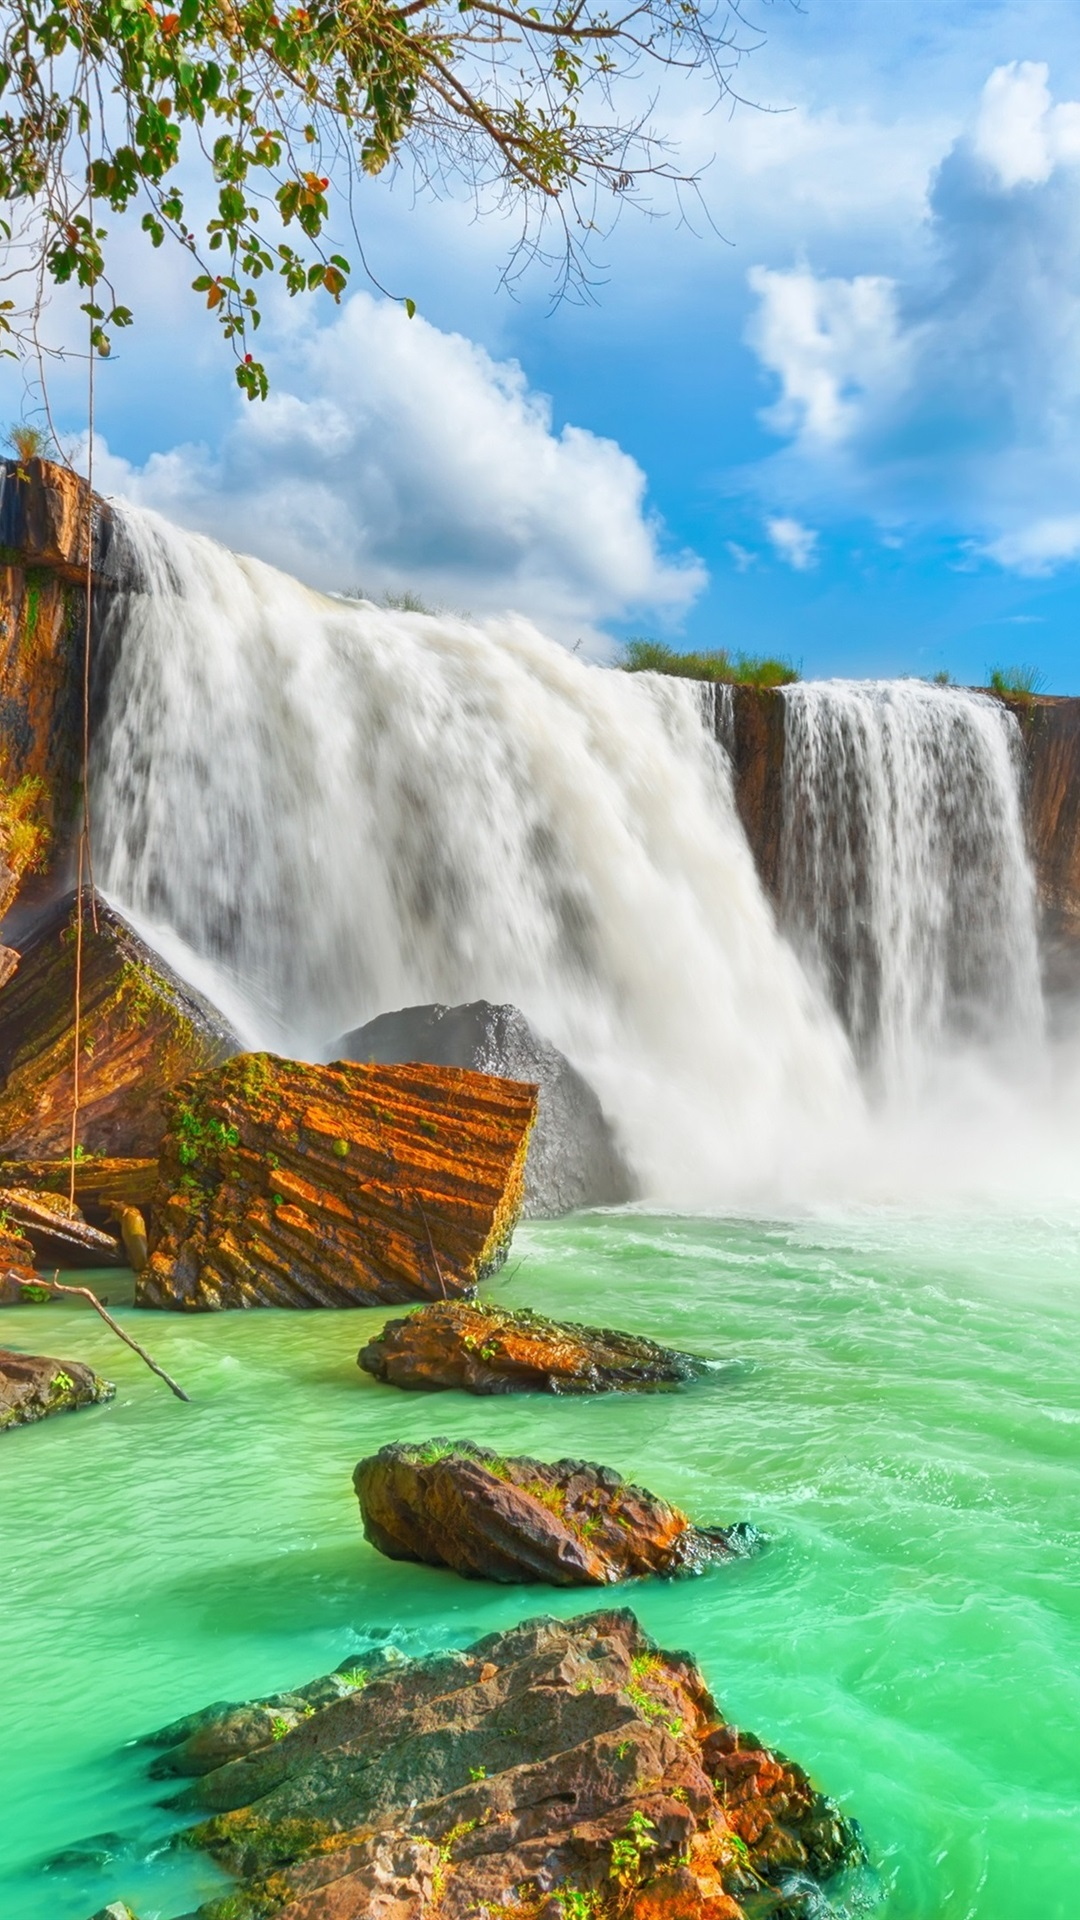 Wallpaper Vietnam, Dray Nur waterfall, beautiful nature landscape 3840x2160 UHD 4K Picture, Image